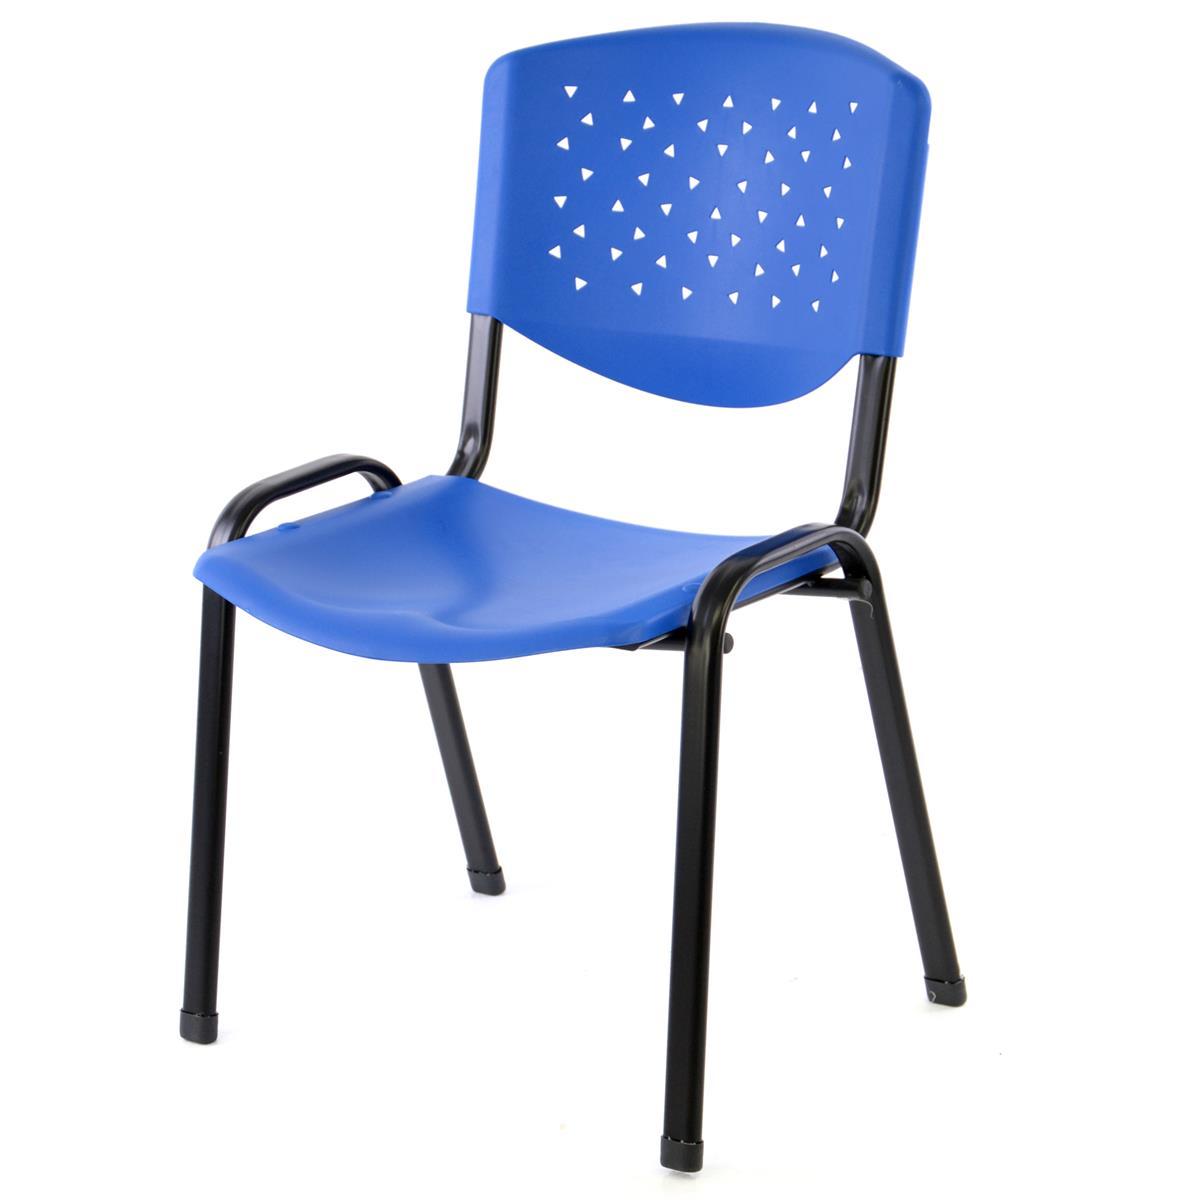 Besucherstuhl Bürostuhl Konferenzstuhl Sitzfläche Blau Kunststoff stapelbar